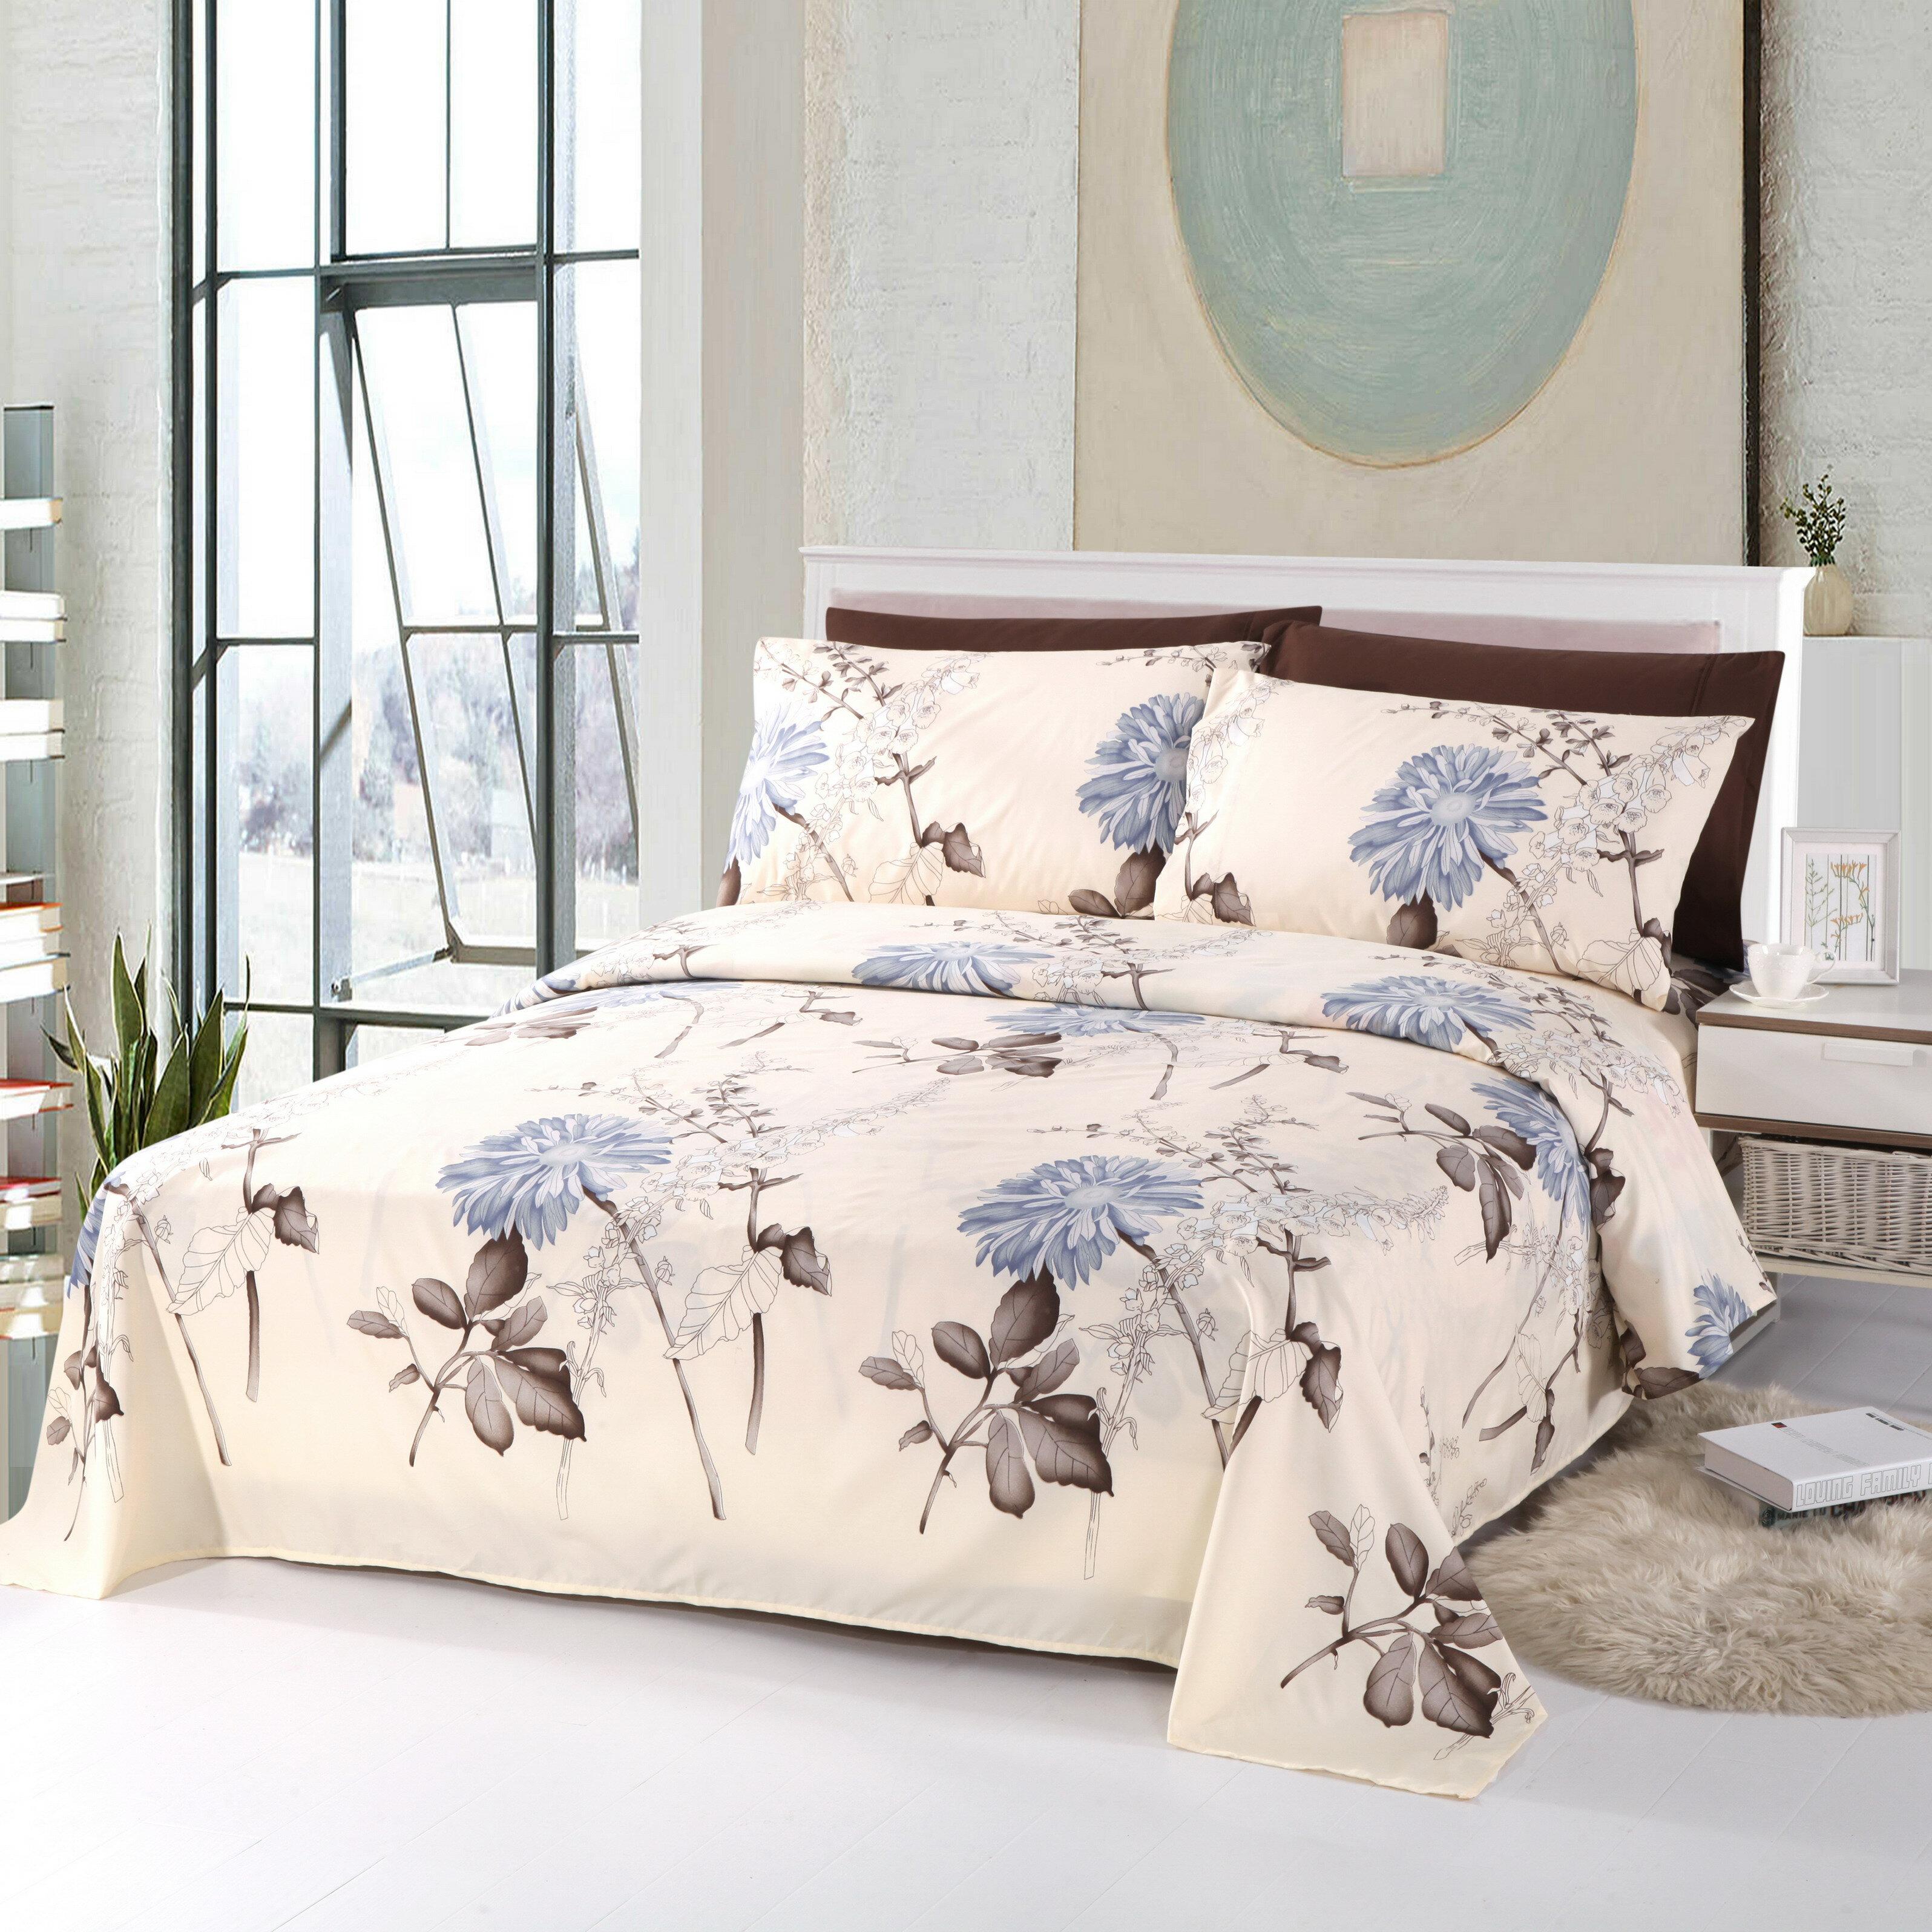 Red Barrel Studio Ruben Eco Friendly Comfortable Floral Rayon Sheet Set Reviews Wayfair